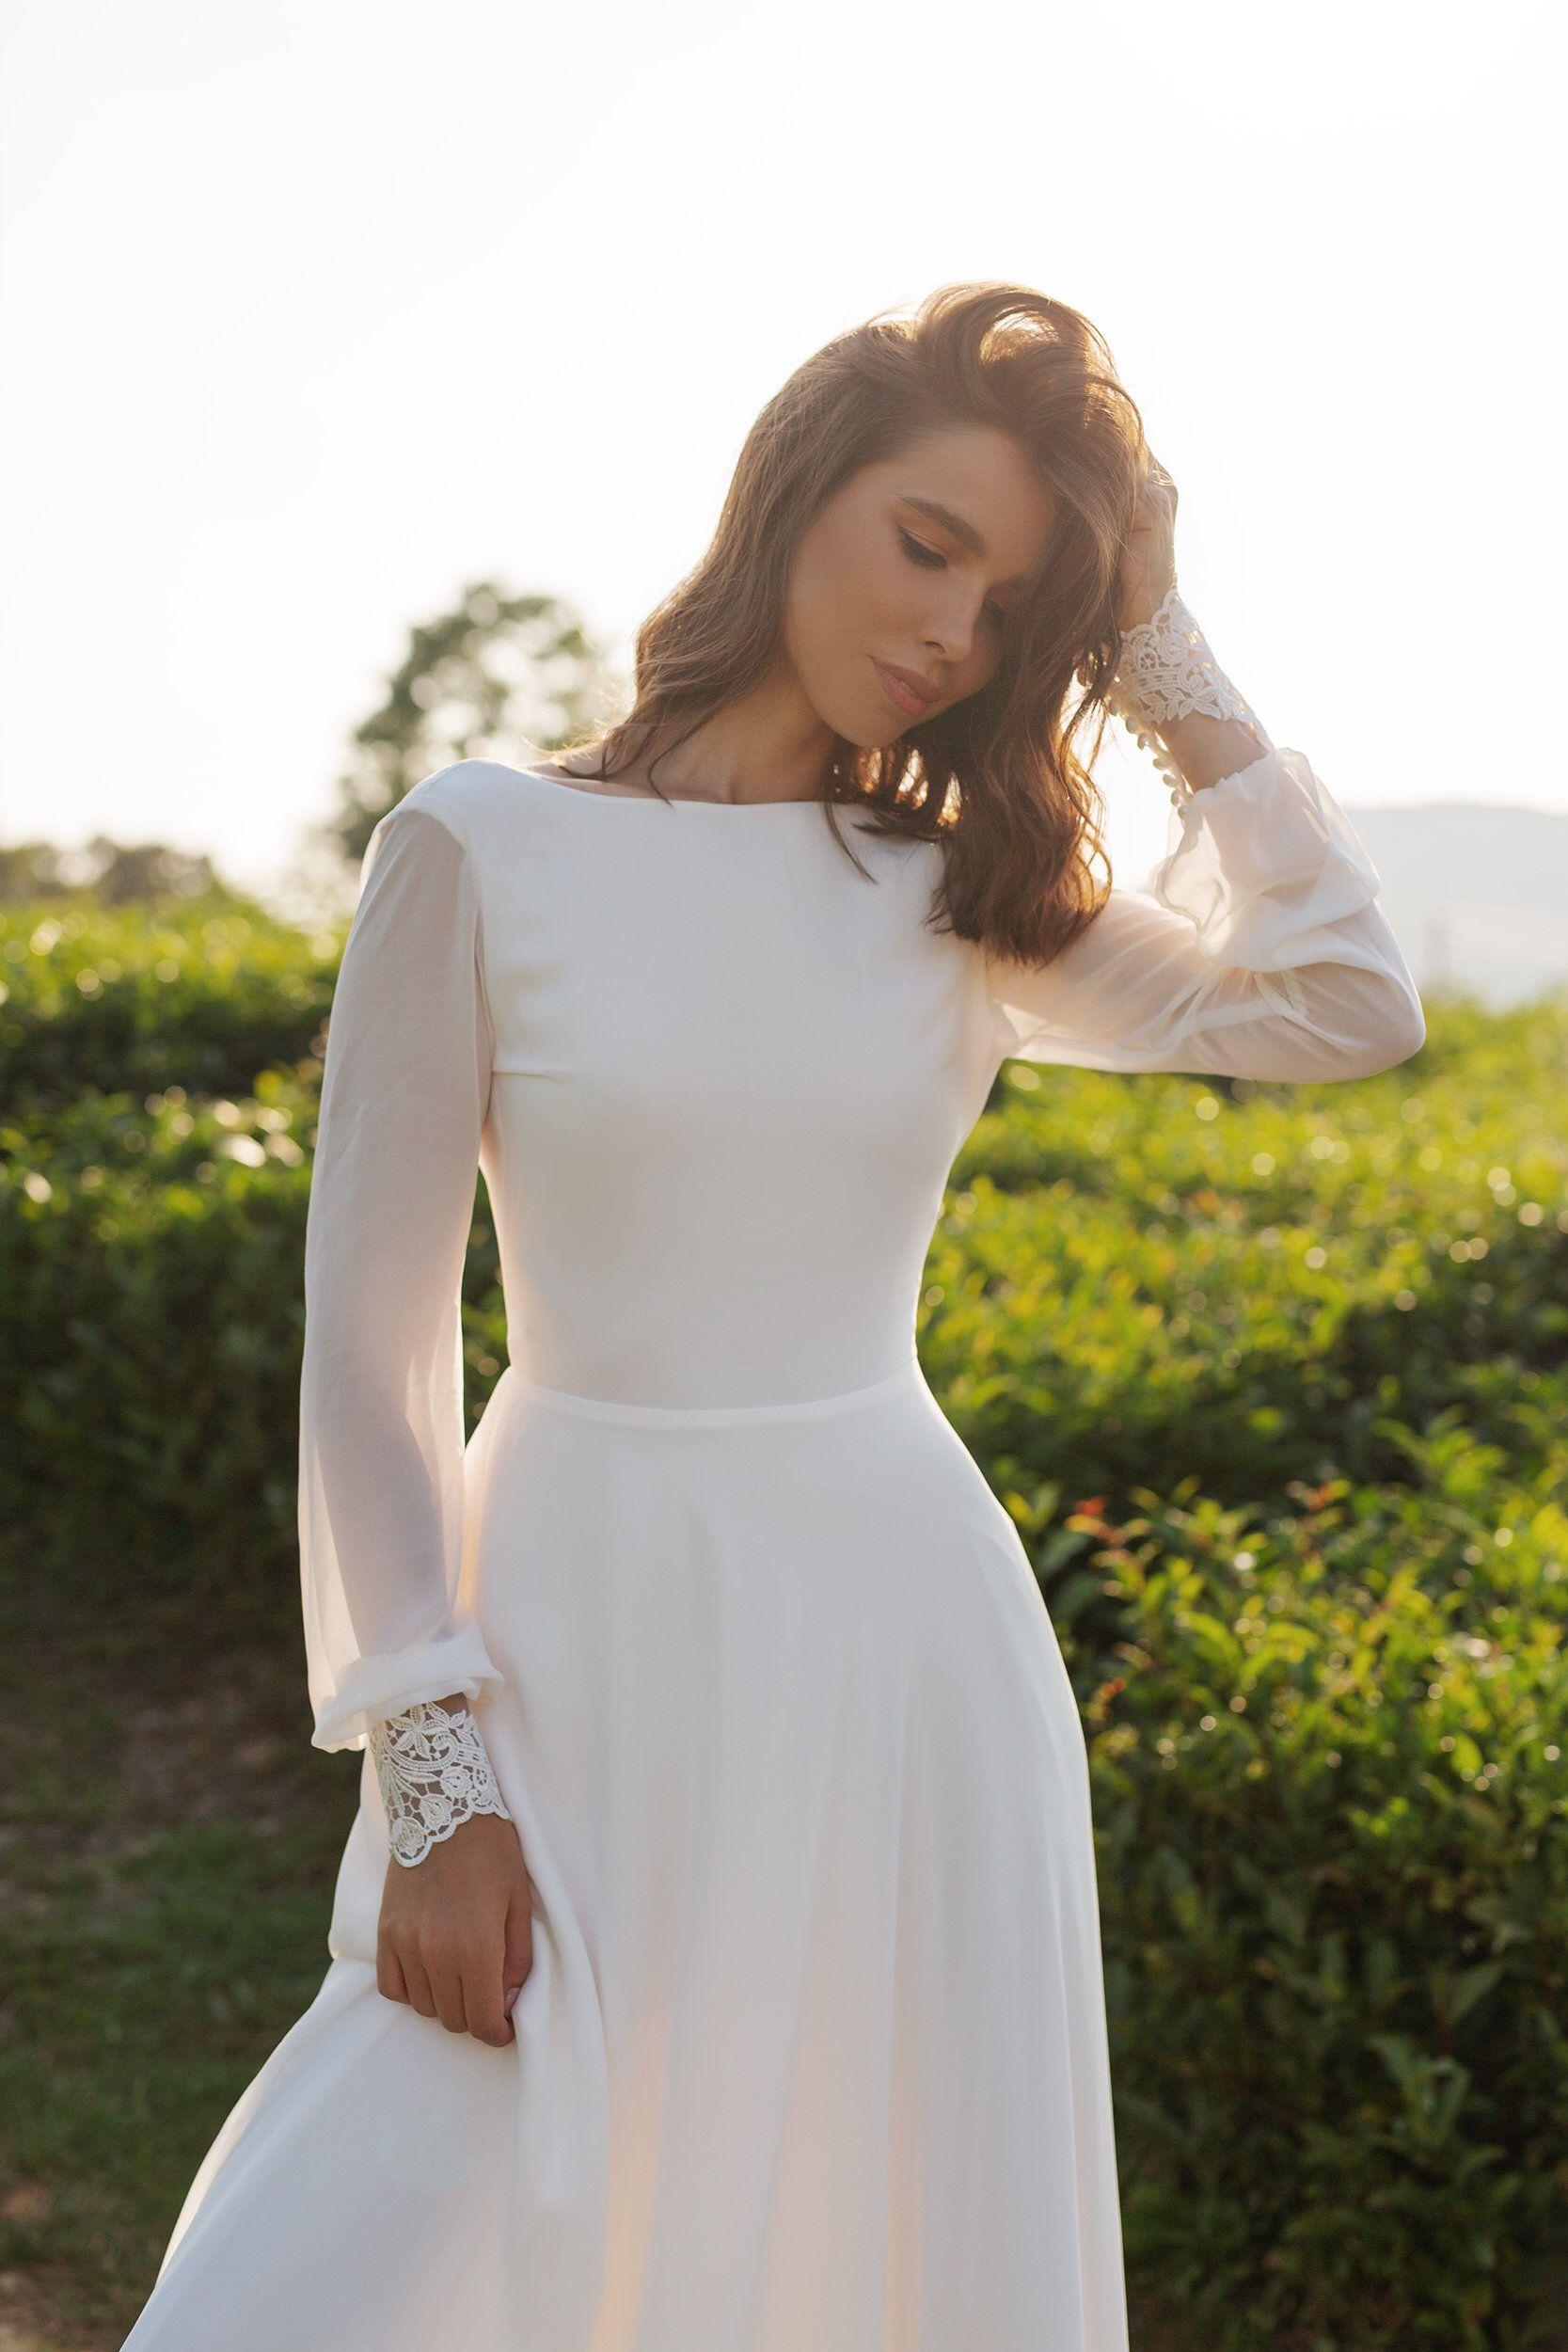 Chiffon Wedding Dress Anasteisha Long Sleeves Simple Wedding Dress With Open Back Chiffon Wedding Dress Wedding Dress Long Sleeve Modest Wedding Dresses [ 2500 x 1667 Pixel ]